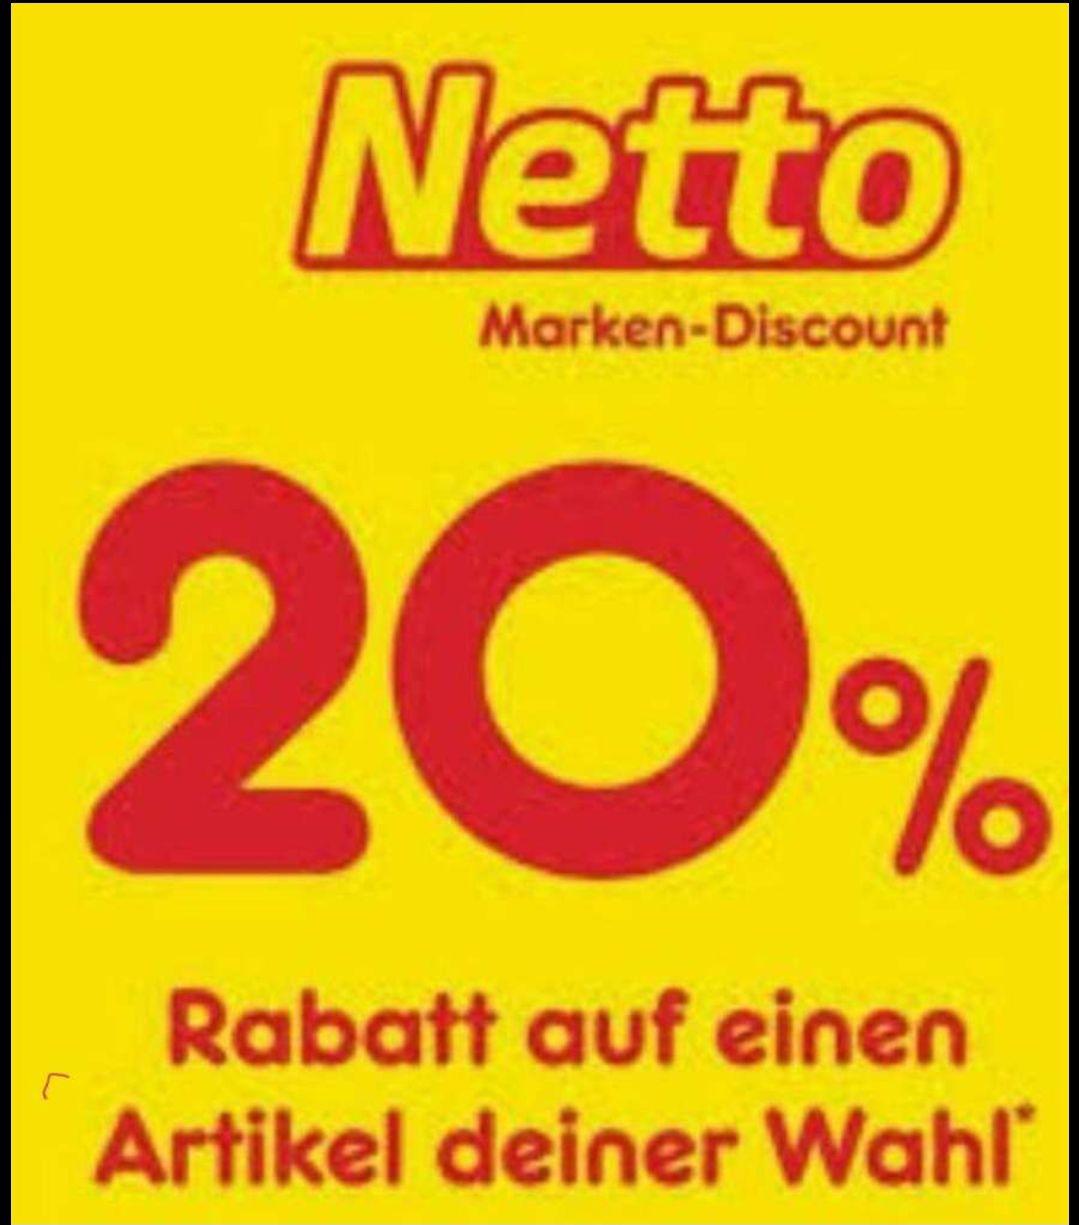 [Netto MD] Rabatt Coupons KW19 (10.05. - 15.05.), bundesweit einsetzbar